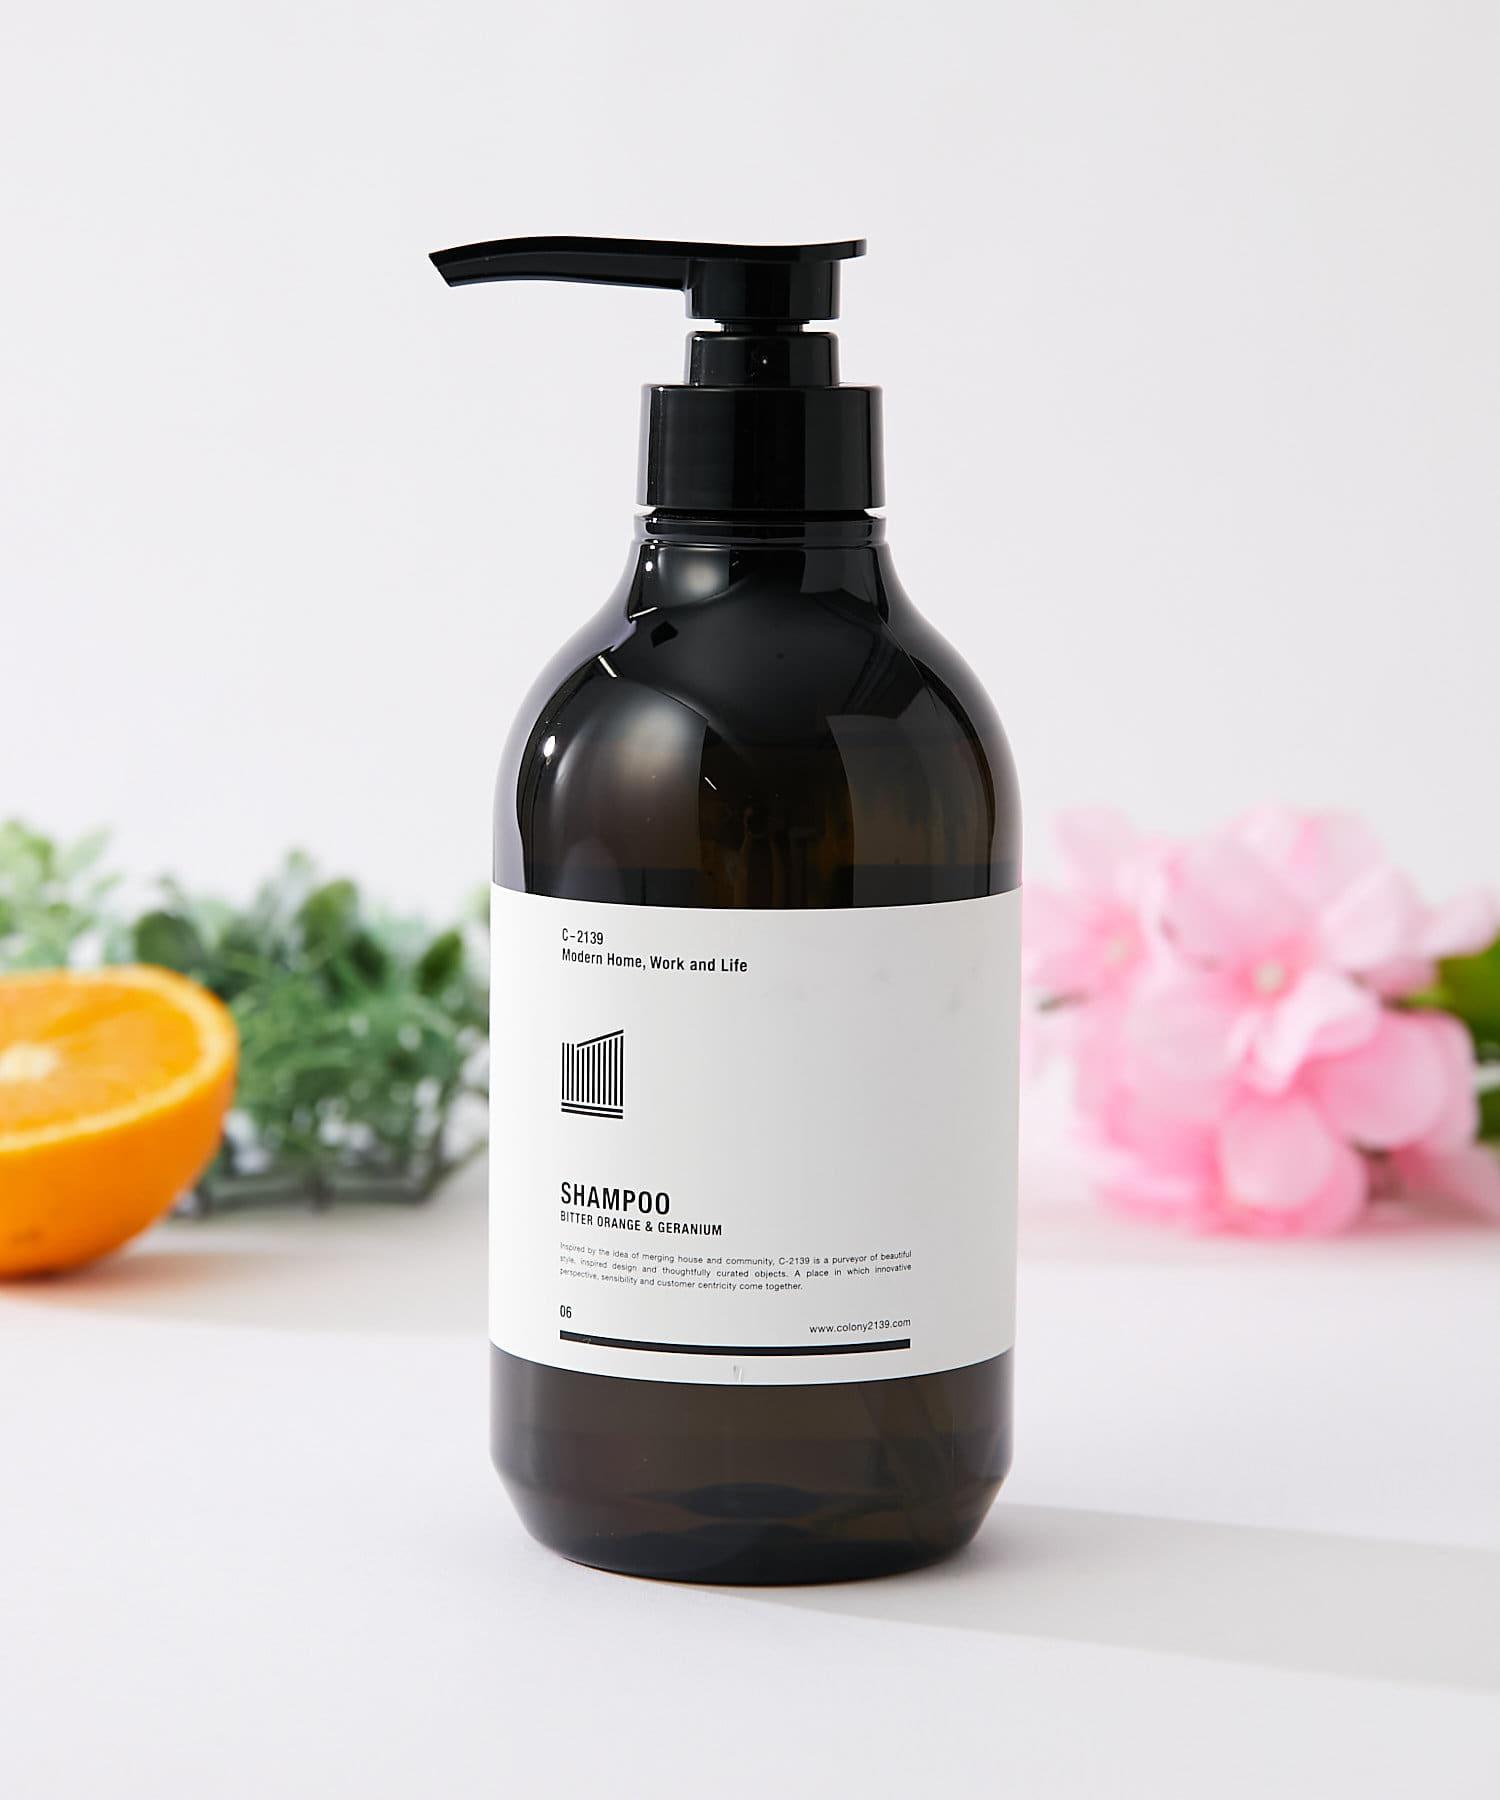 COLONY 2139(コロニー トゥーワンスリーナイン) ライフスタイル シャンプー(ビターオレンジ&ゼラニウムの香り) ブラック